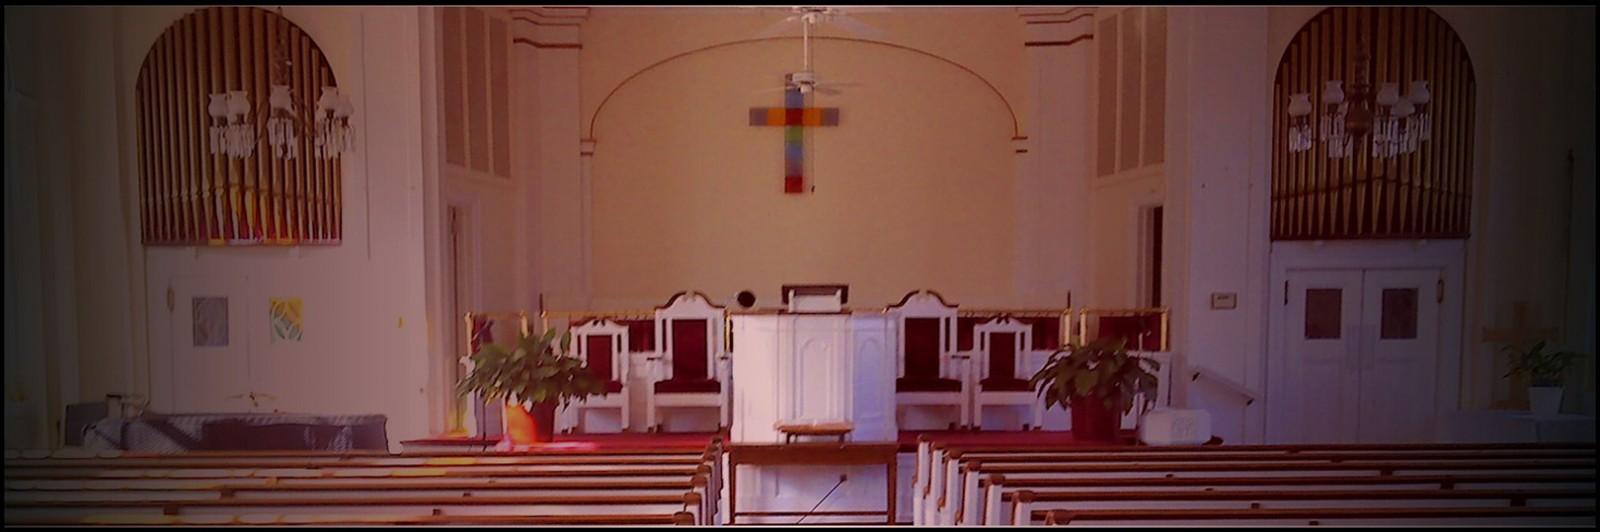 hpc-headers-sanctuary1